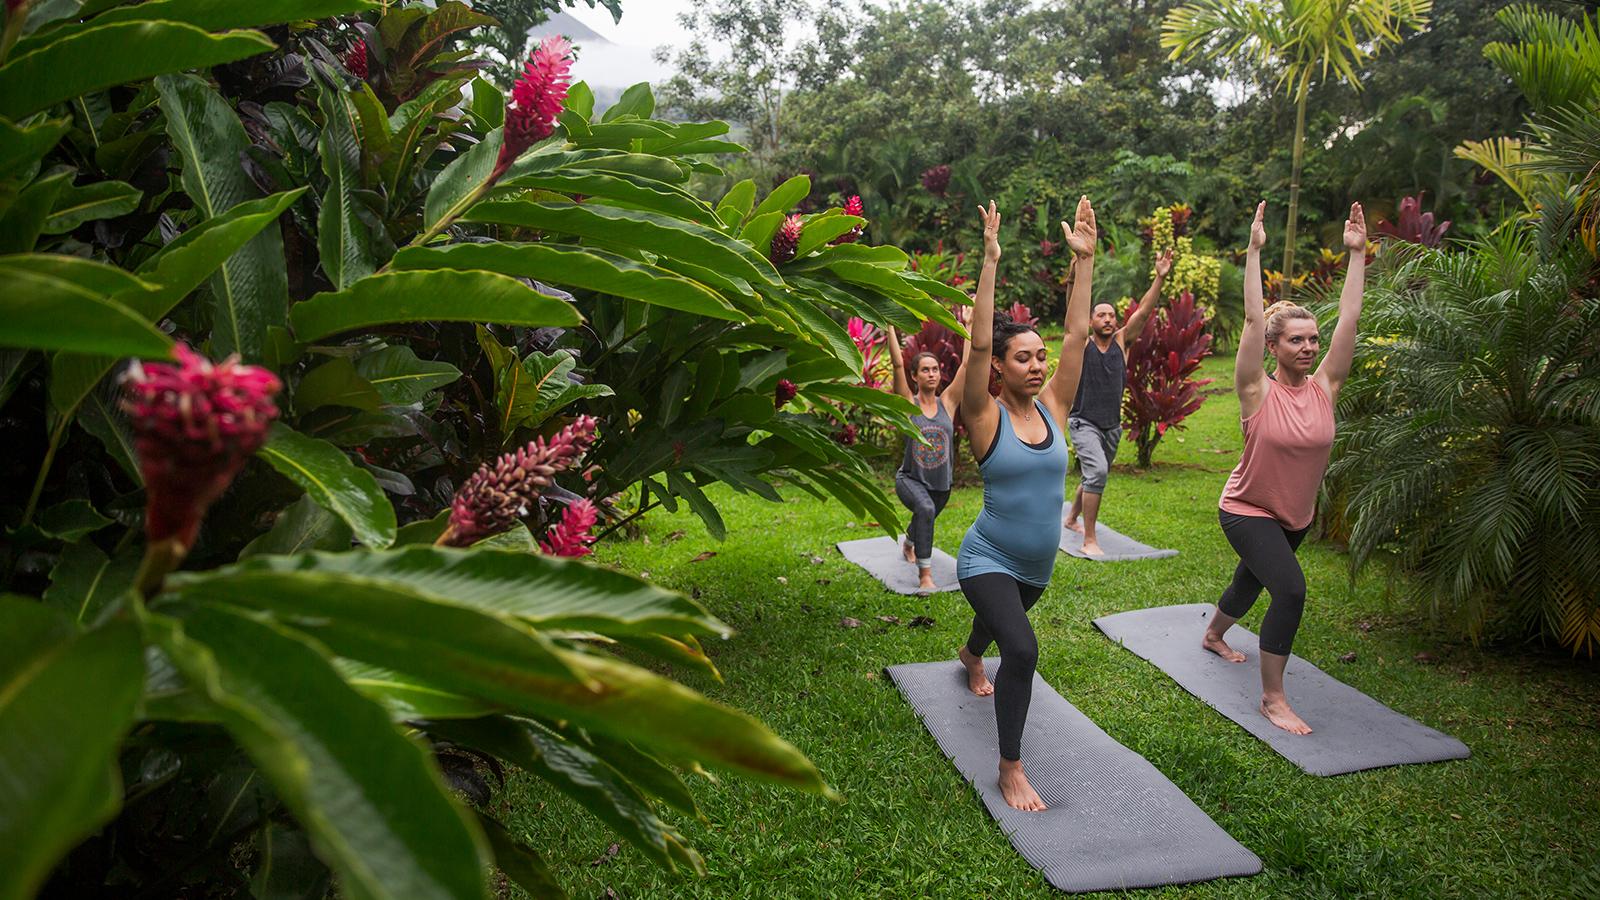 163c819f046e3__Costa_Rica_La_Fortuna_Garden_Yoga_Group_Pose_-_2018_0W3A7933_Lg_RGB.jpg